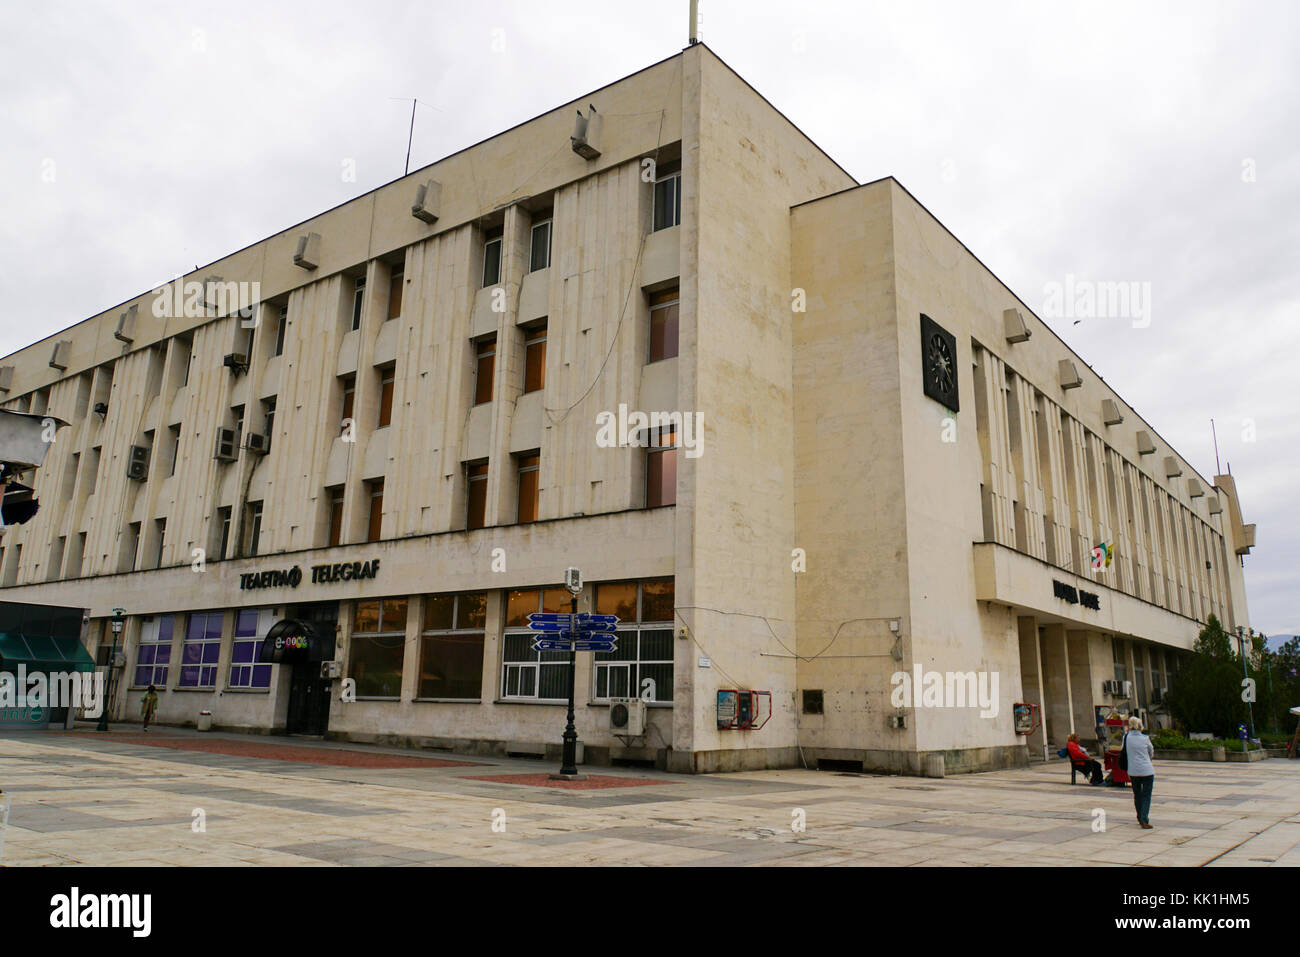 Main post office, Plovdiv, Bulgaria - Stock Image